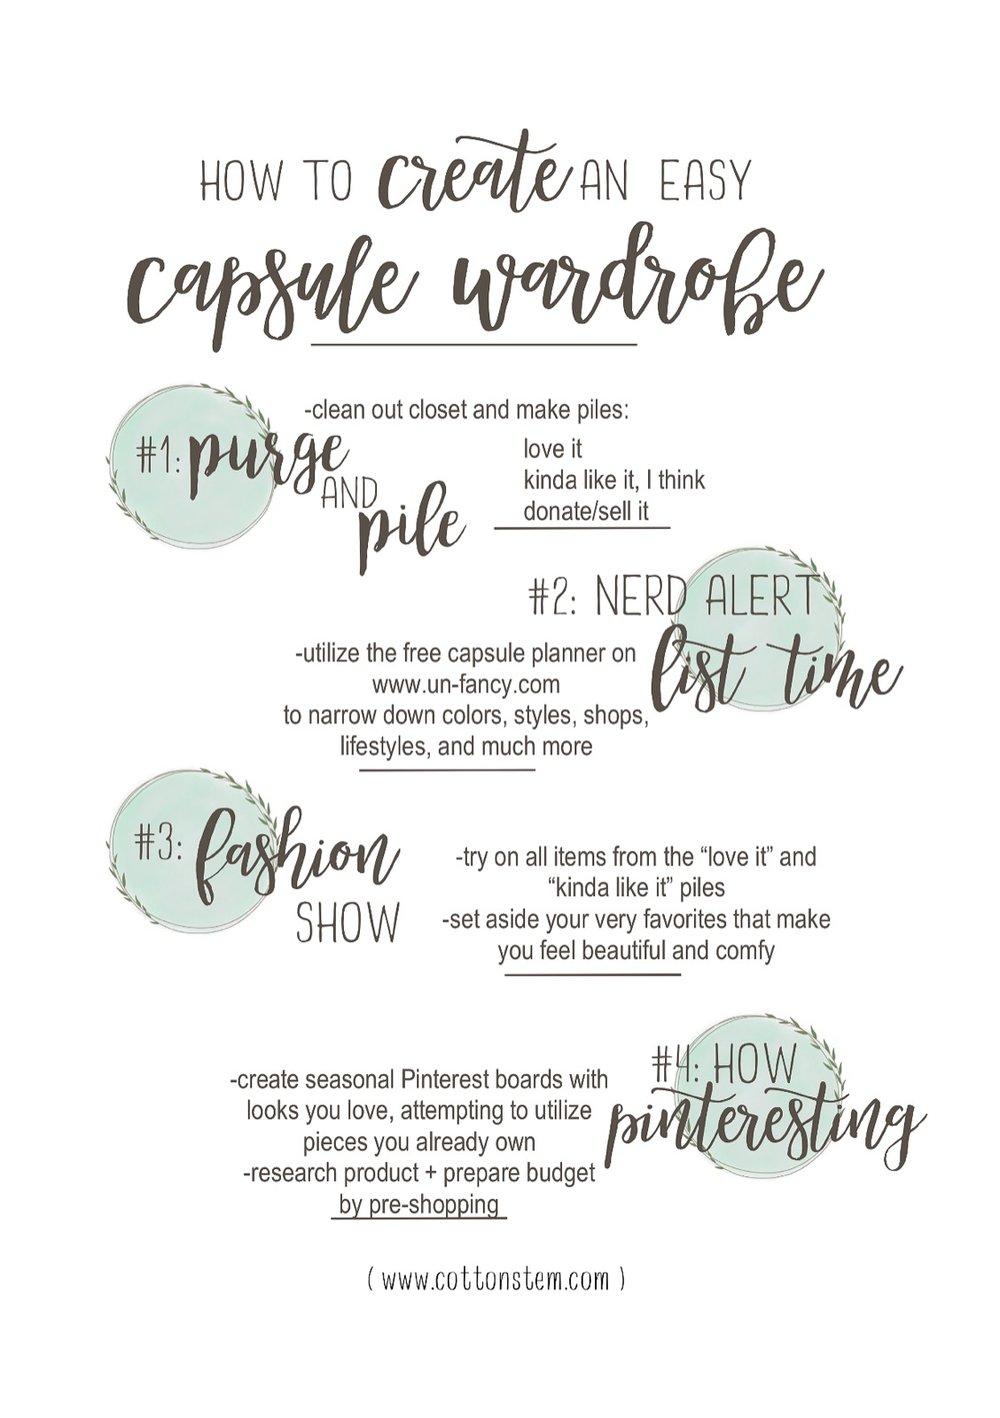 Cotton Stem Blog capsule wardrobe series how to 4.JPG